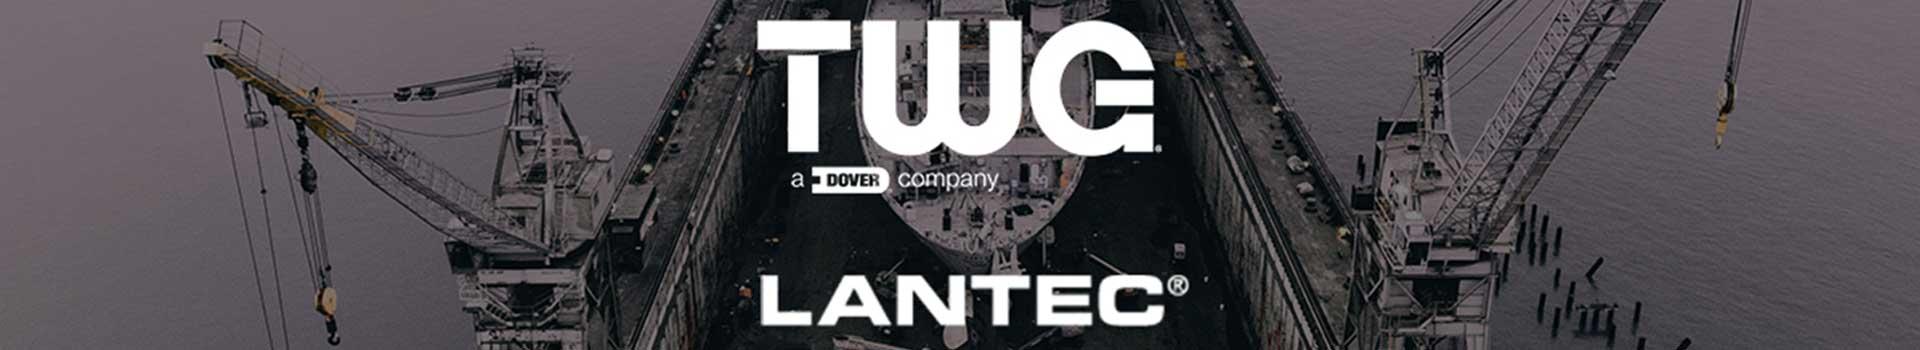 LantecBlog-Header